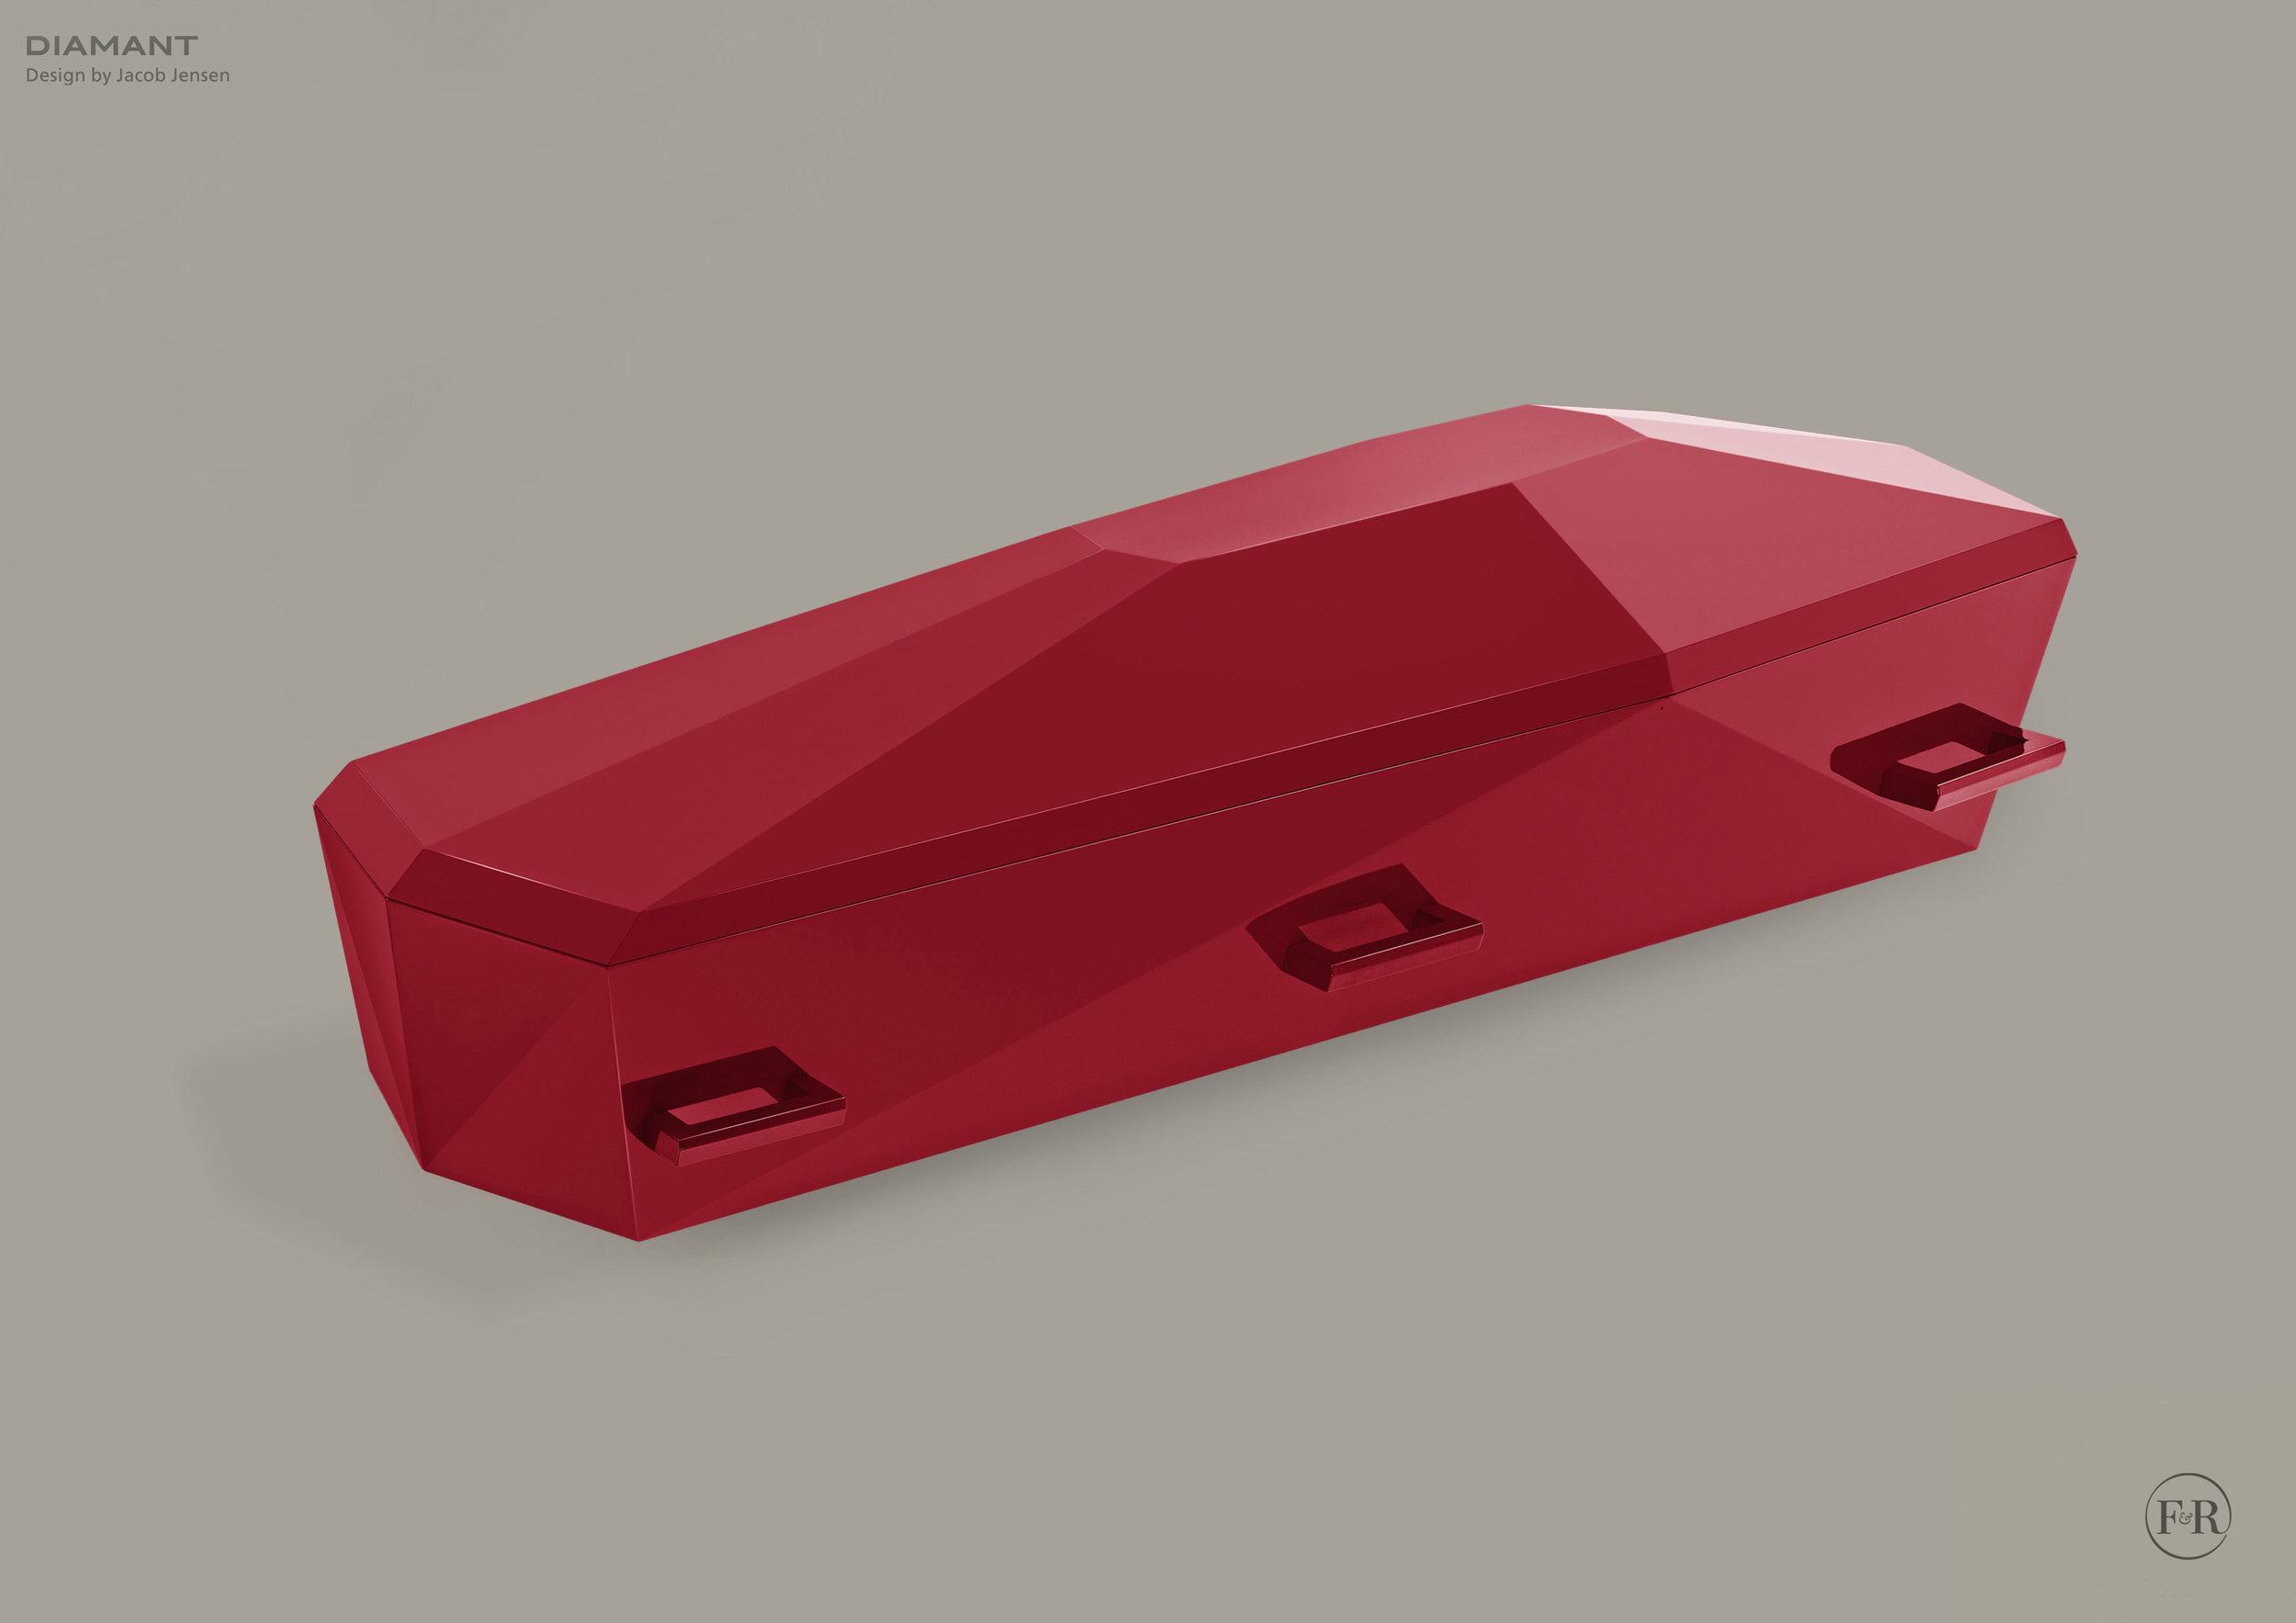 10980 DIAMANT 32 rød, højglans.jpg